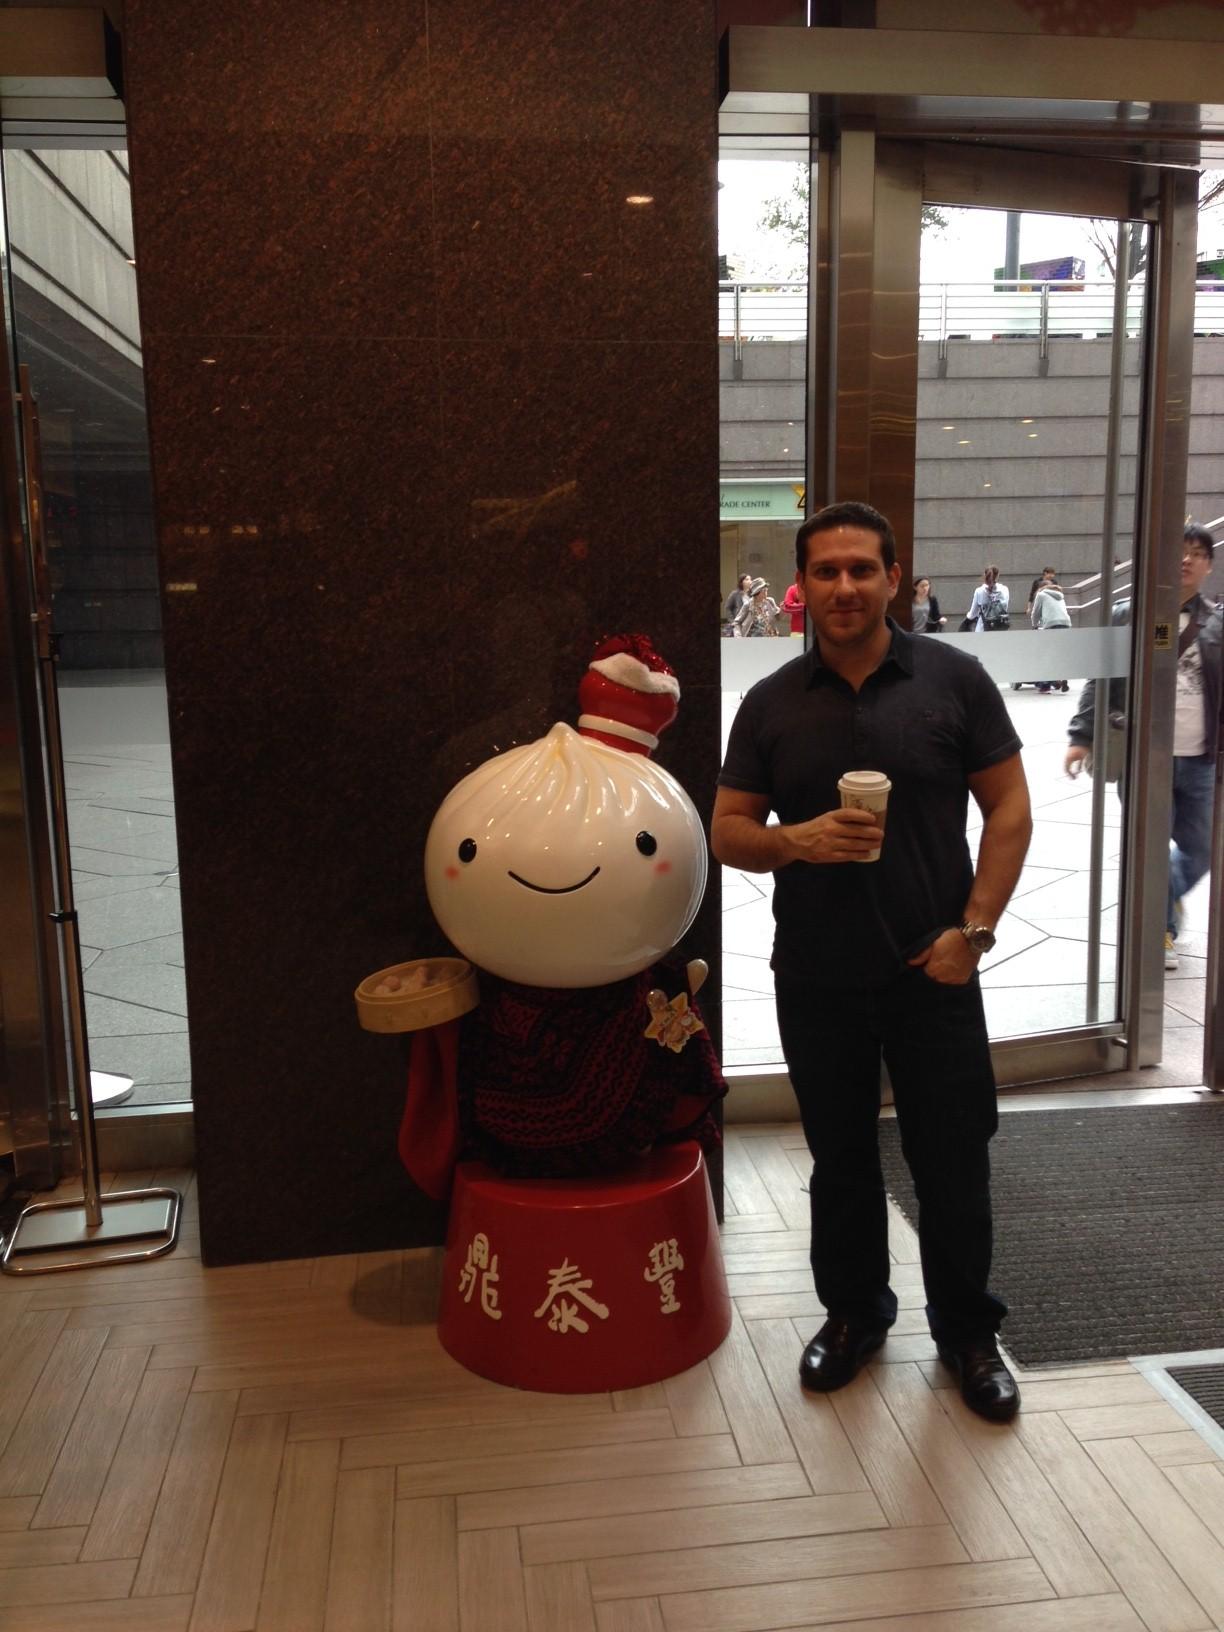 DELI_Michael Ferraro Taiwan Trip 21.JPG